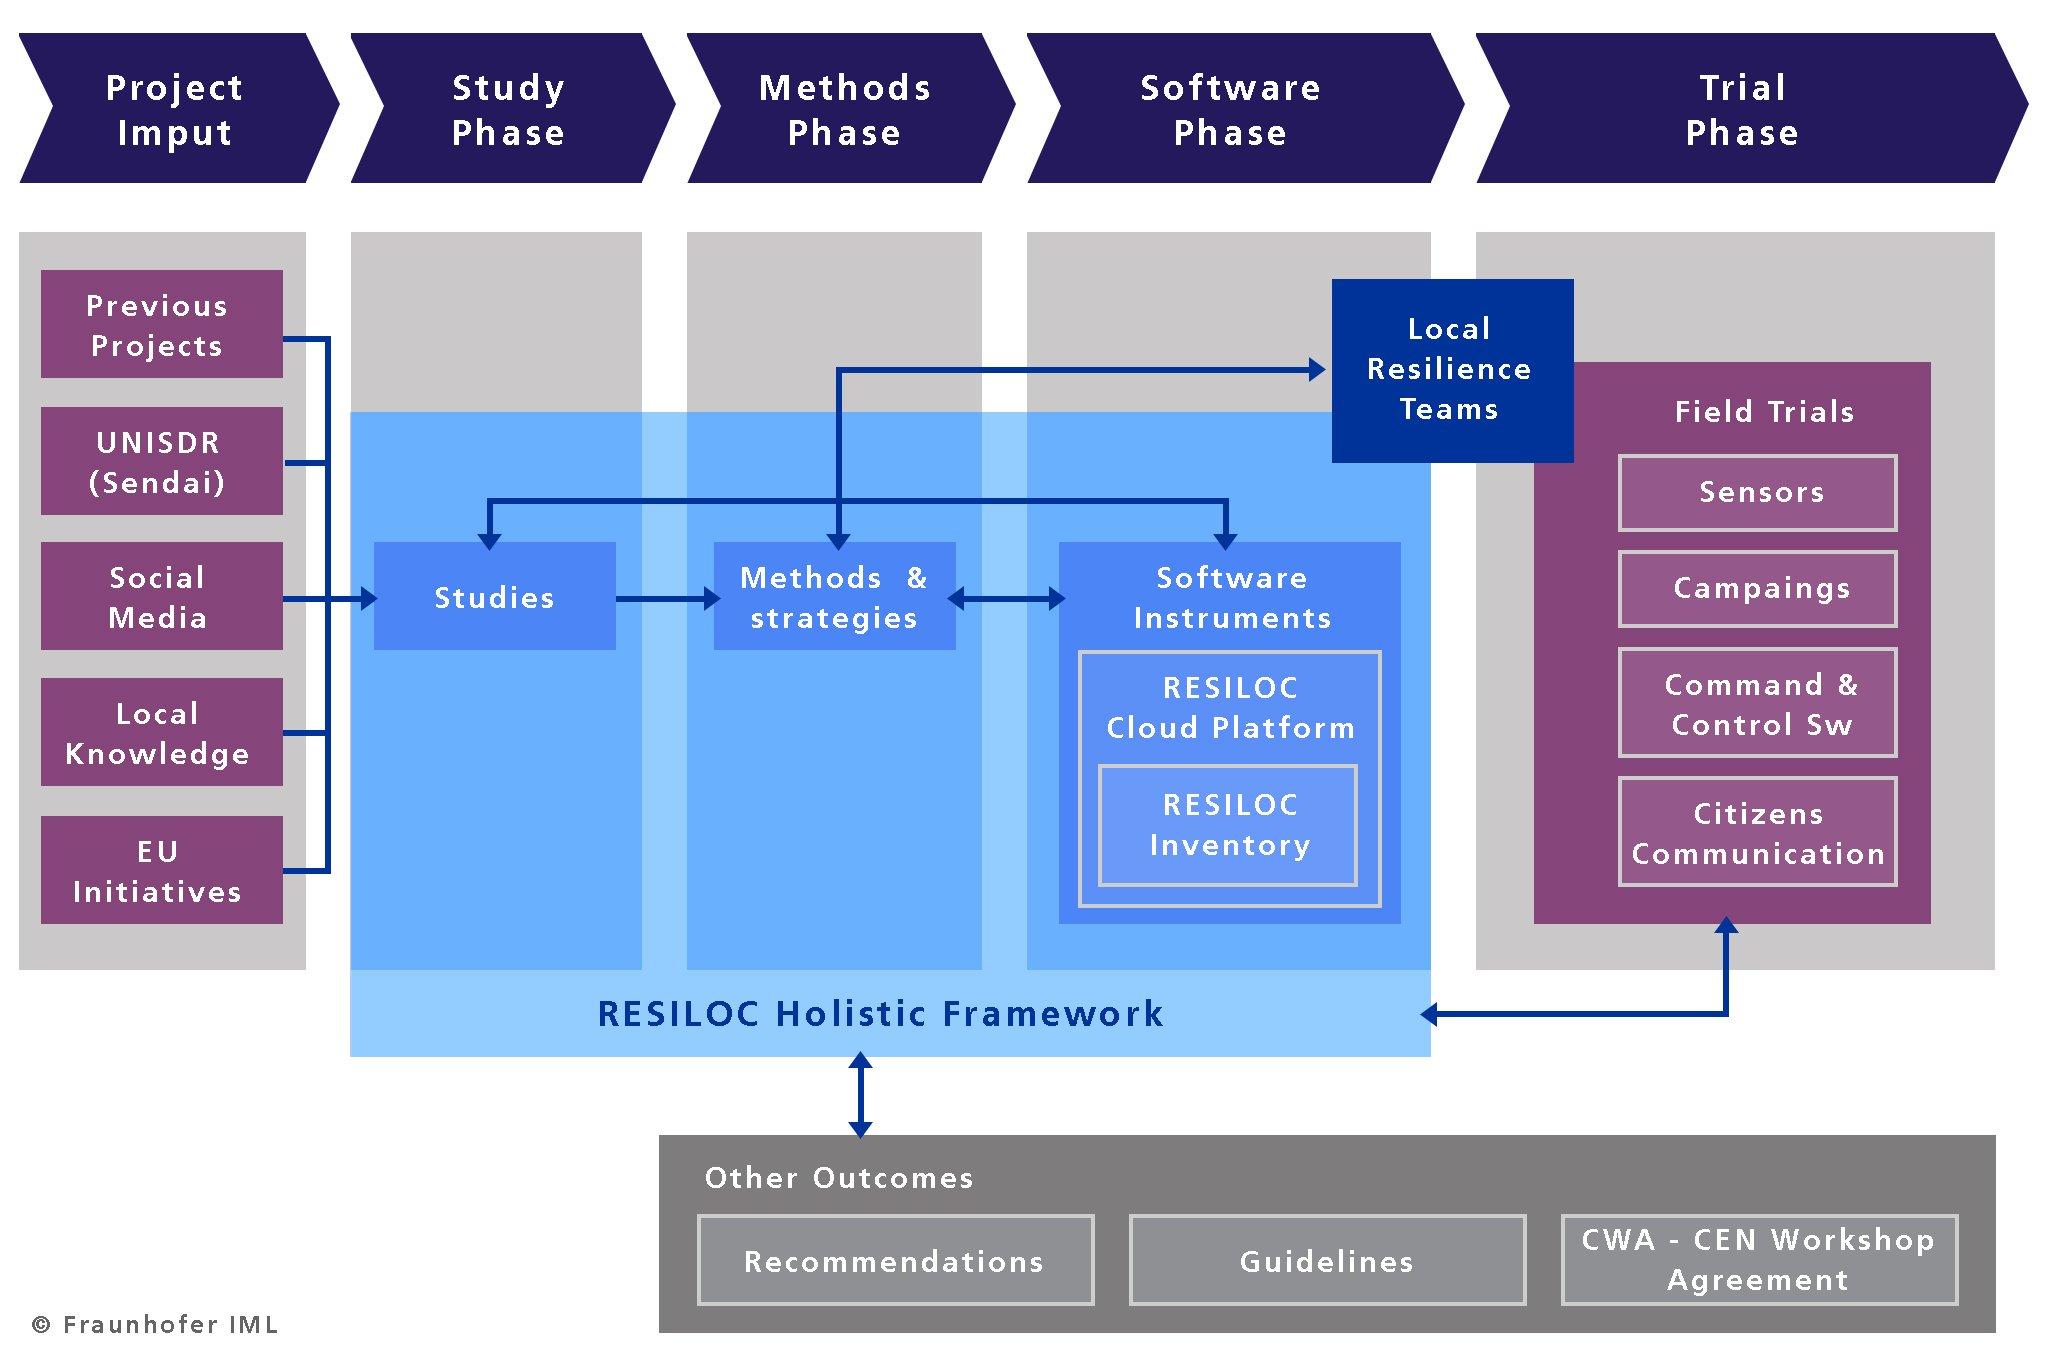 RESILOC Framework